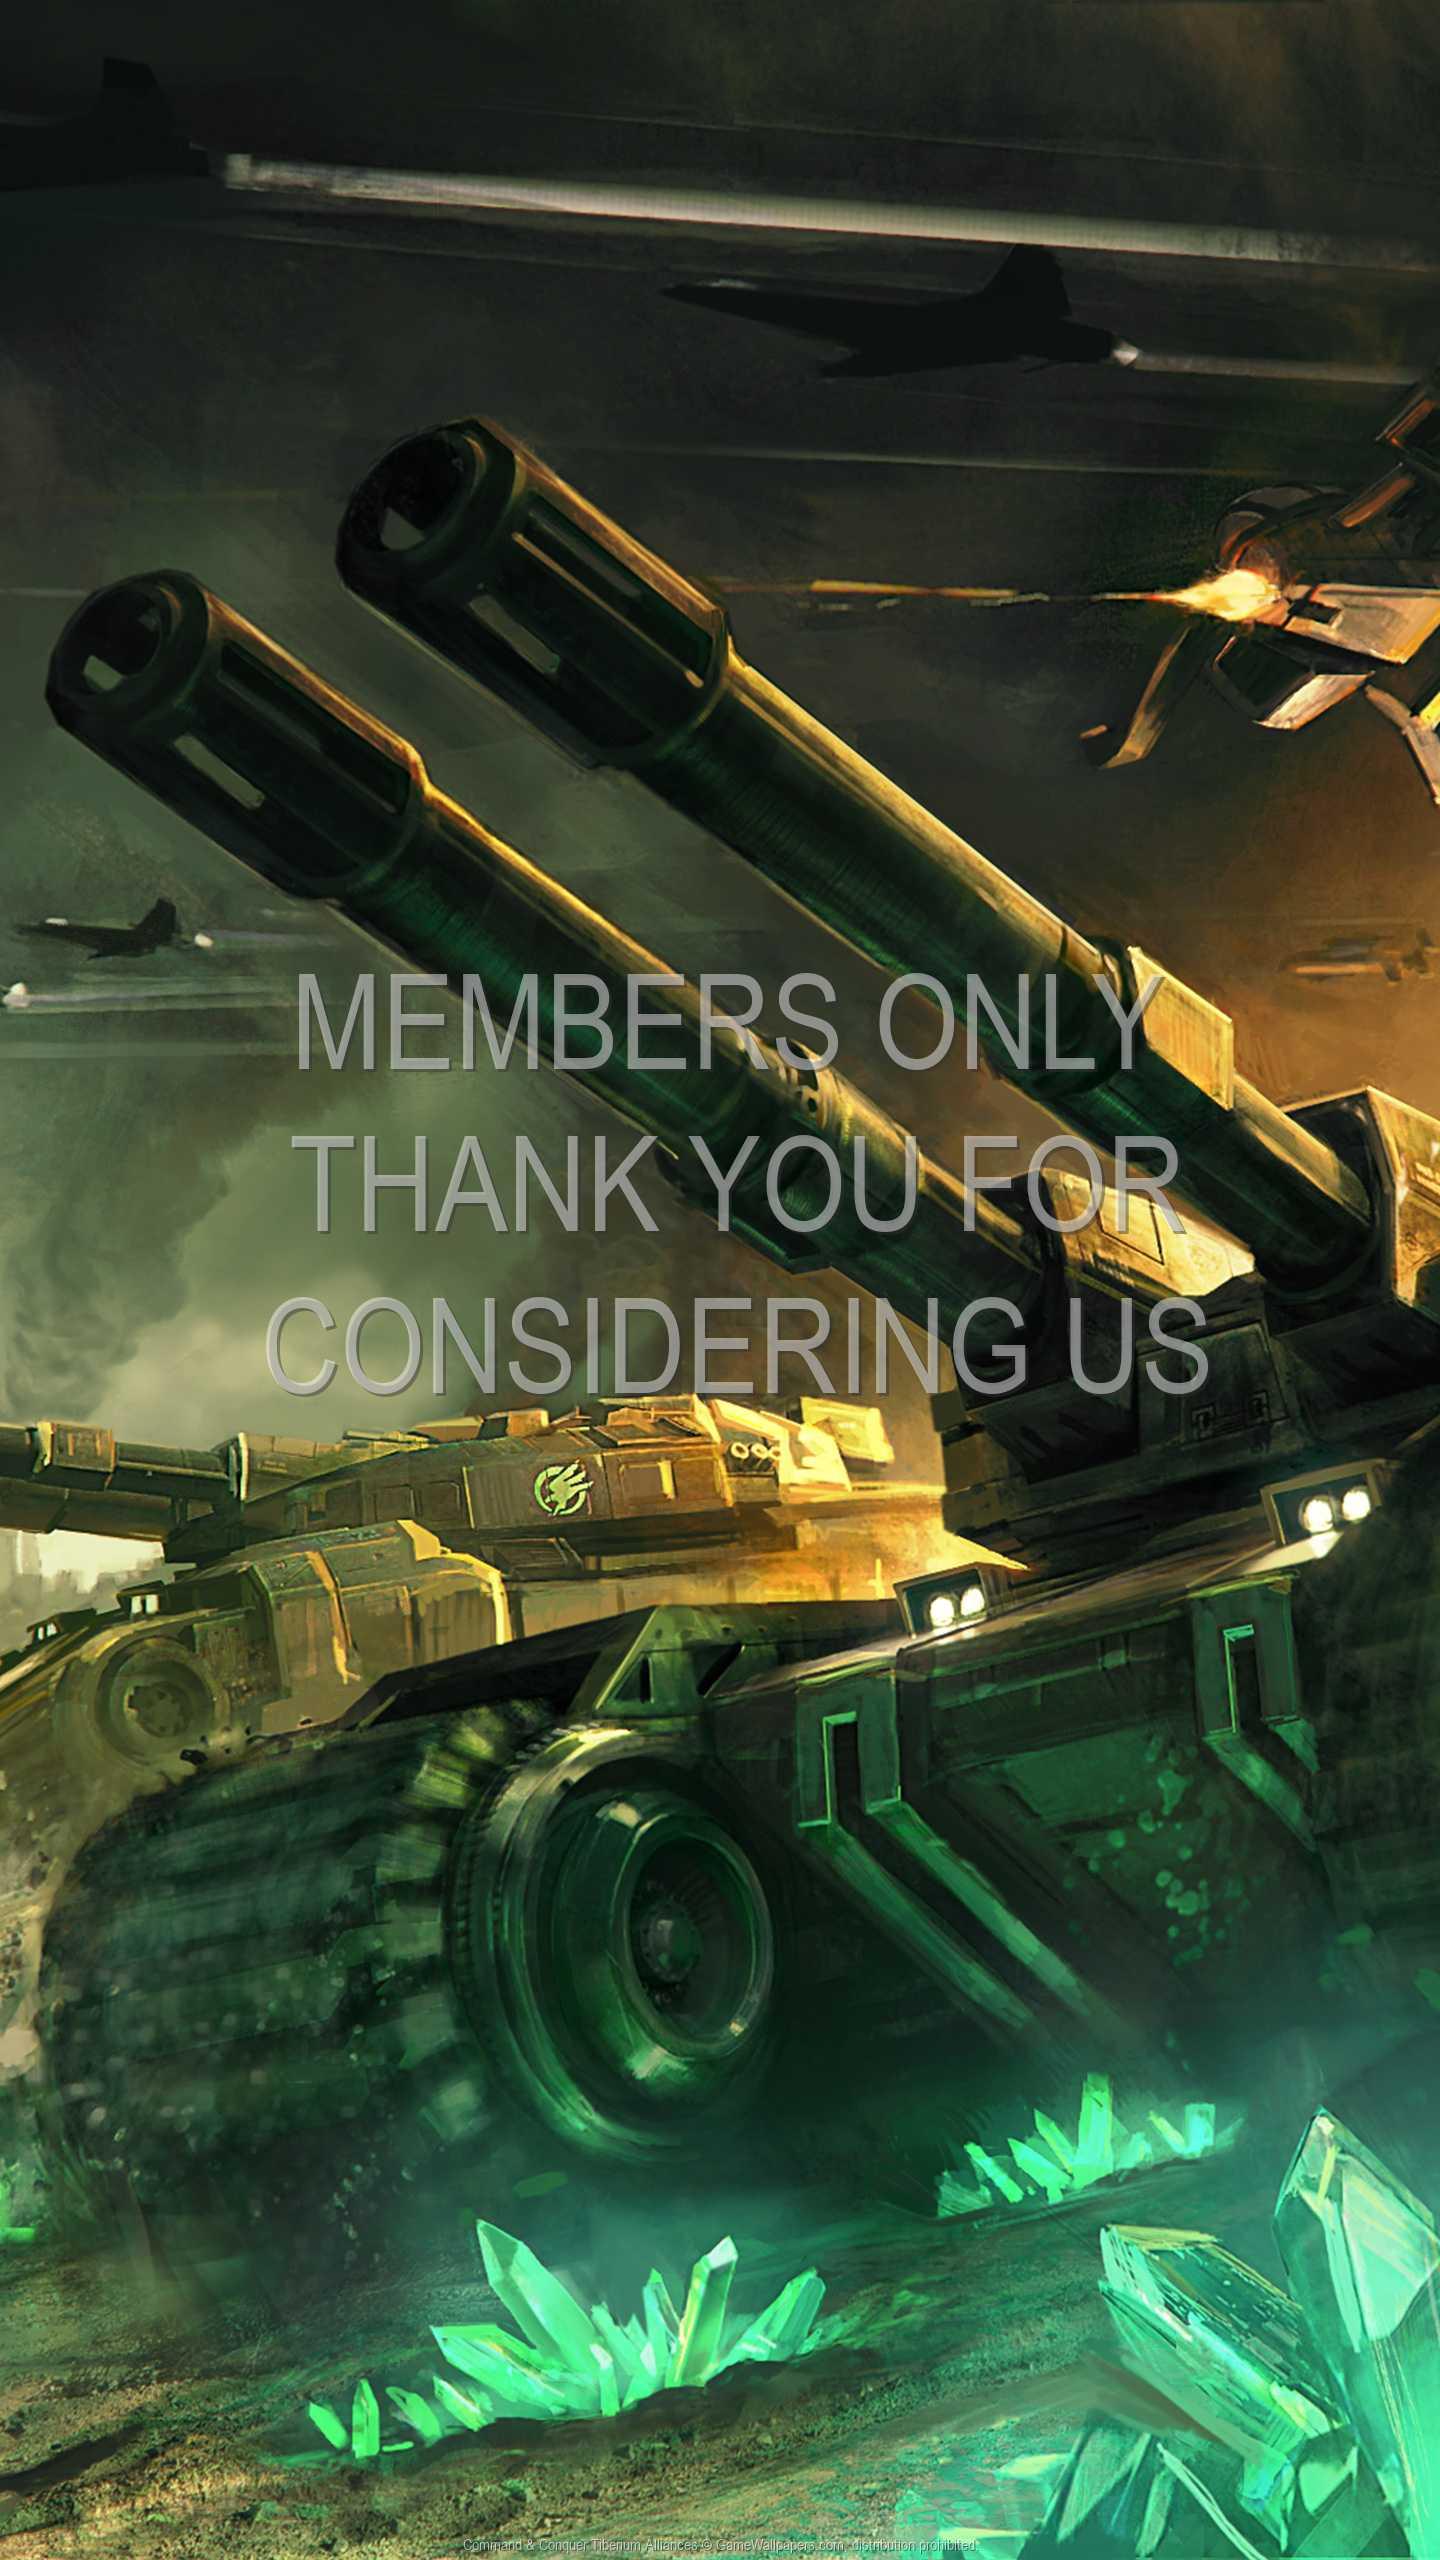 Command & Conquer: Tiberium Alliances 1440p Vertical Mobile wallpaper or background 01